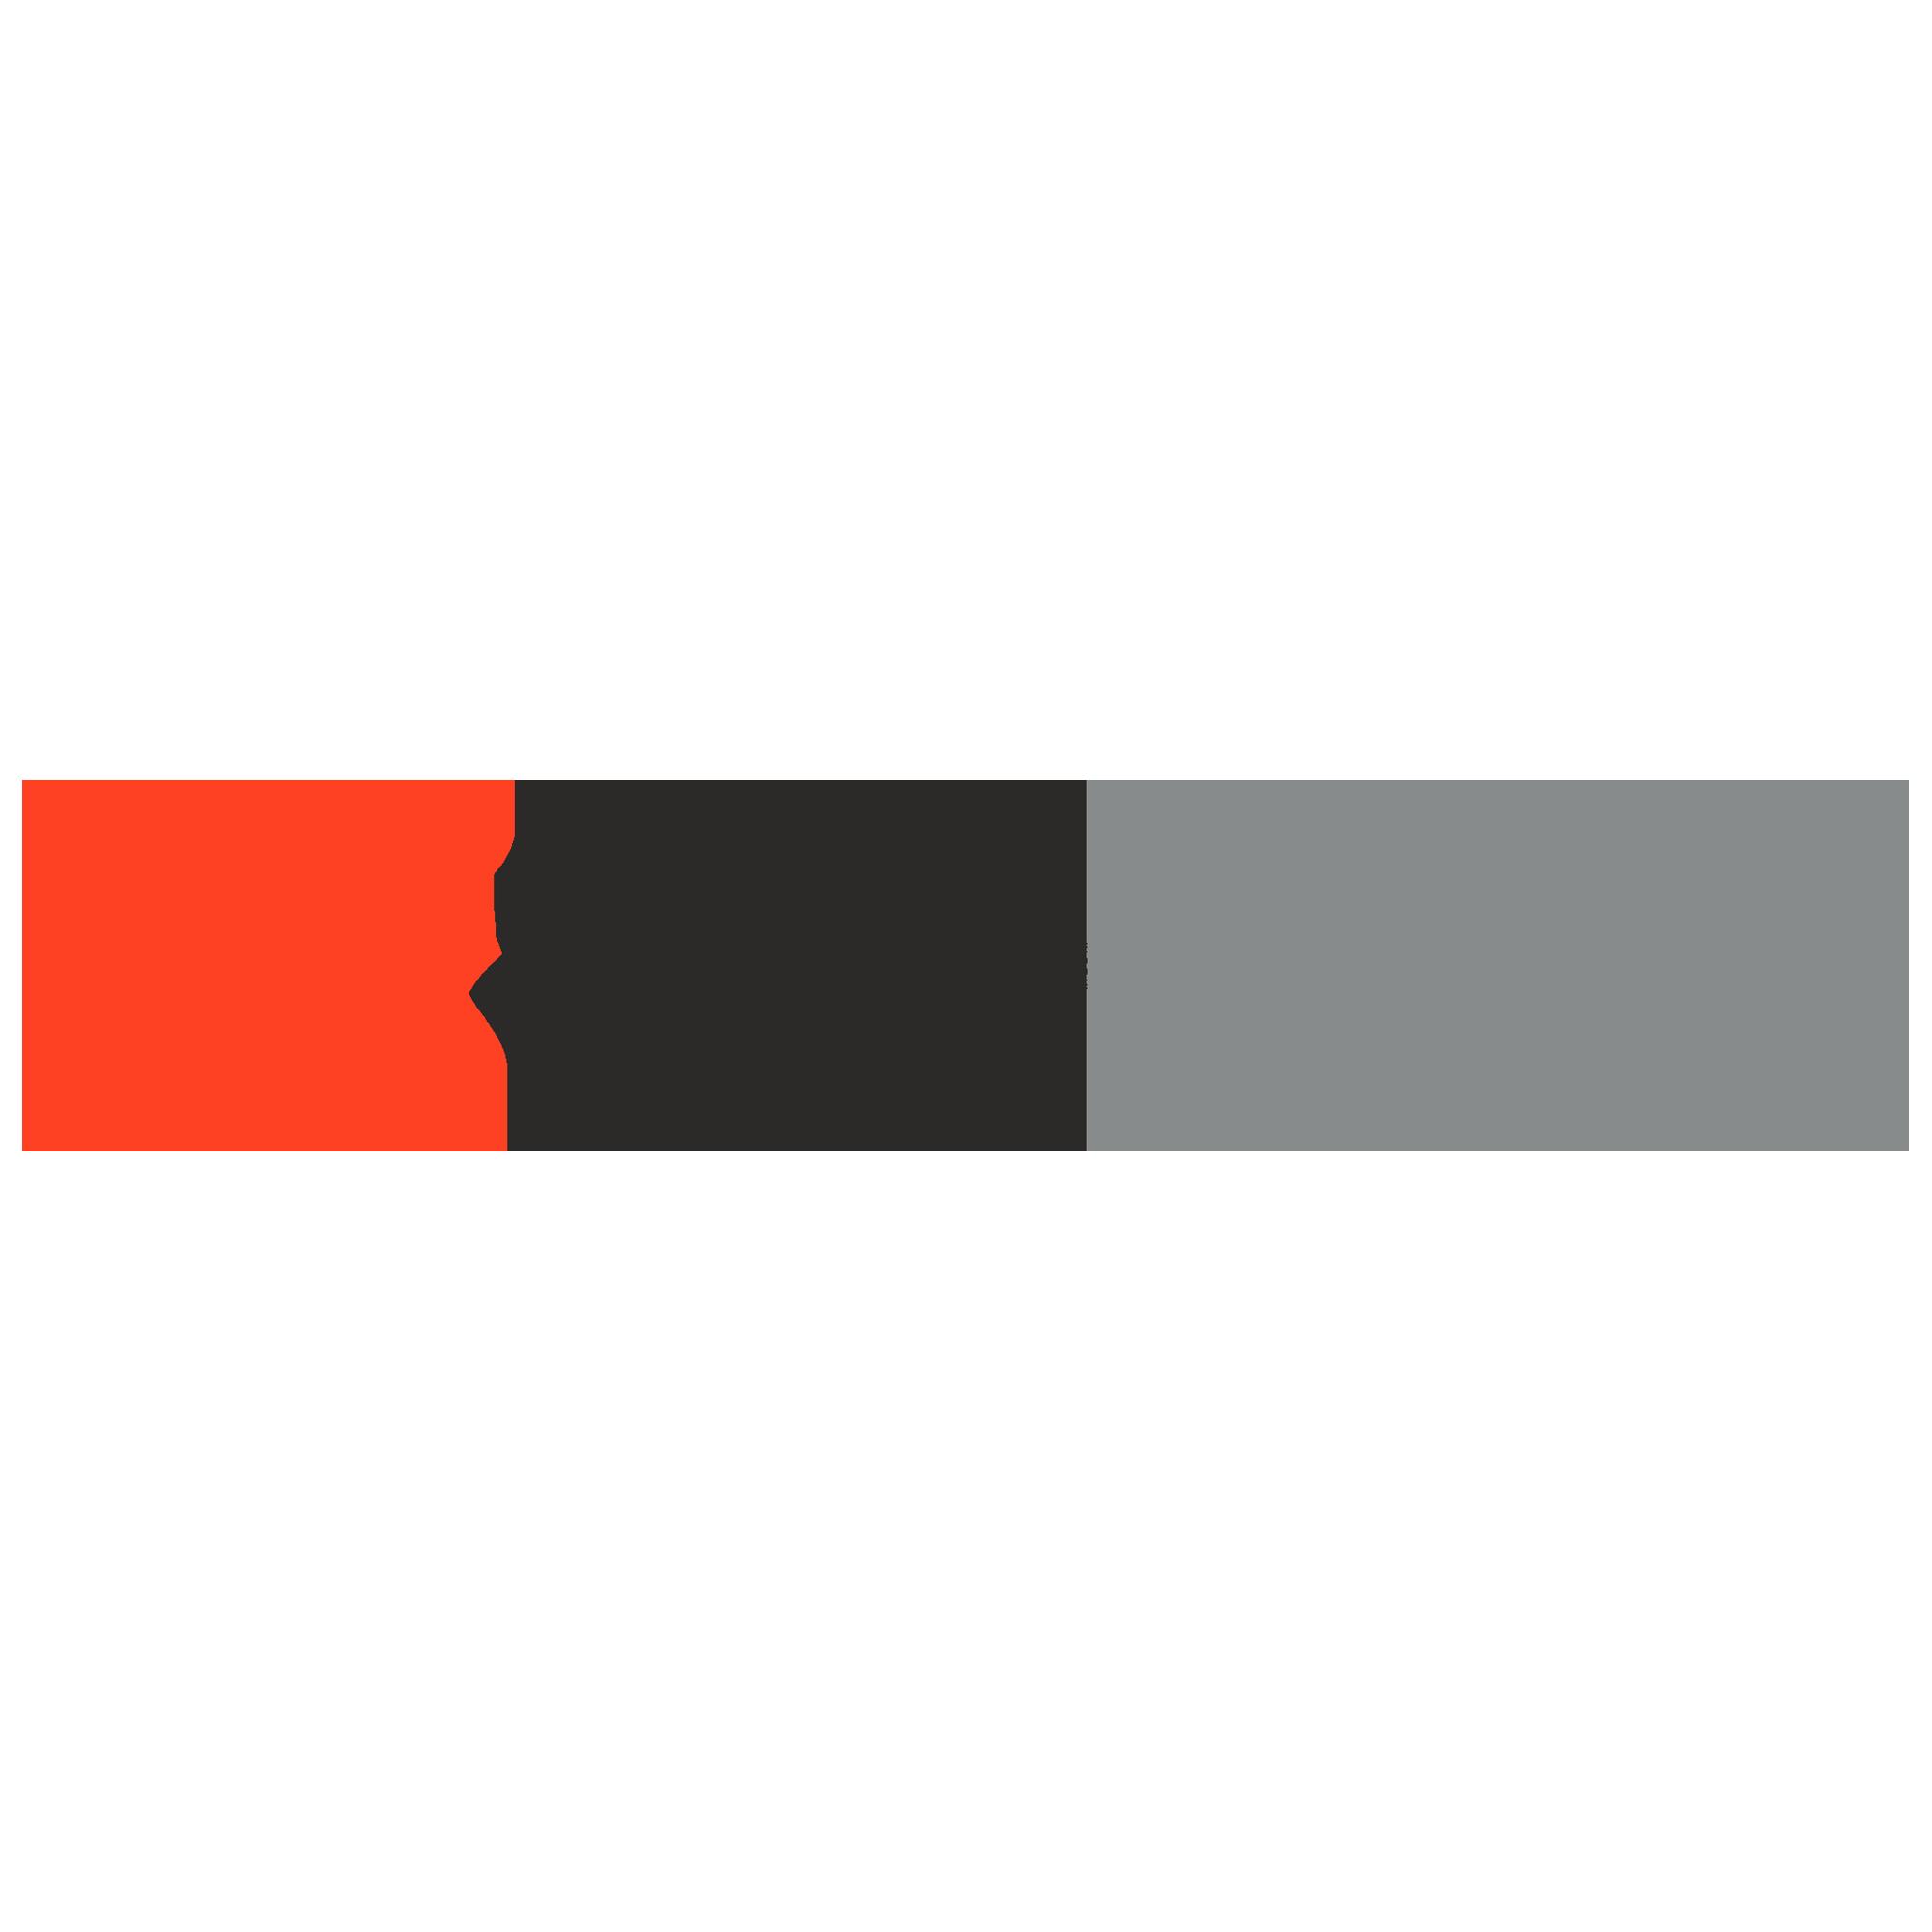 Argodesign